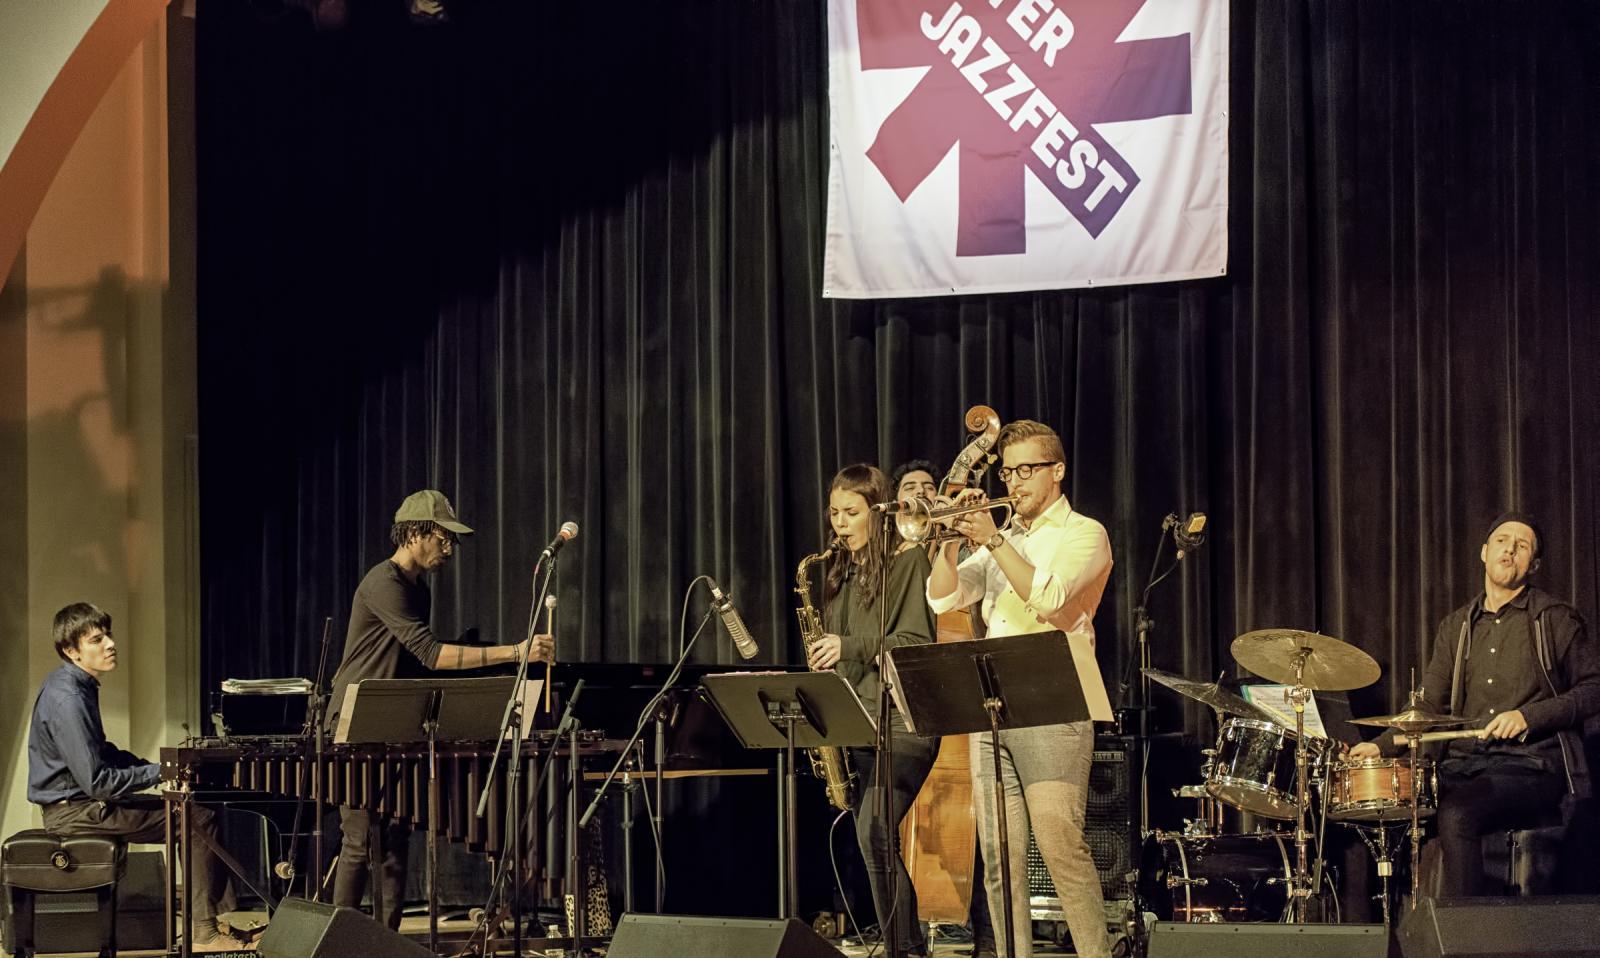 Glenn Zaleski, Joel Ross, Pablo Menares, Melissa Aldana, Philip Dizack and Craig Weinrib at The NYC Winter Jazzfest 2017